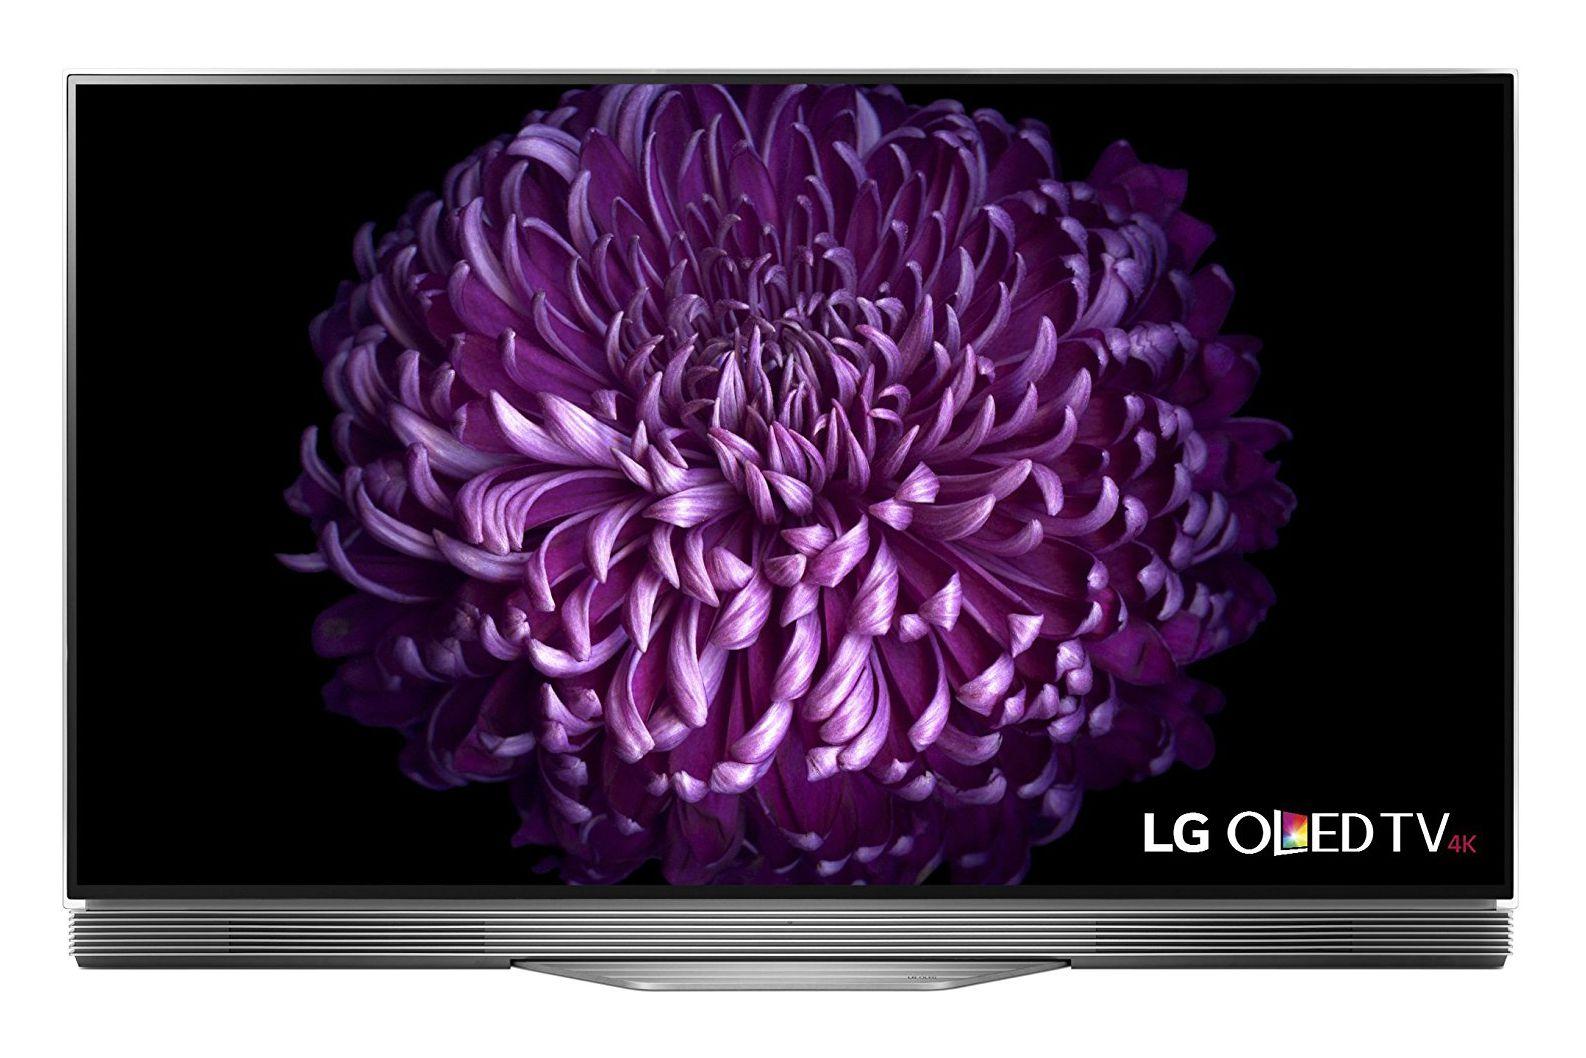 b84edef4d The 8 Best Smart TVs of 2019